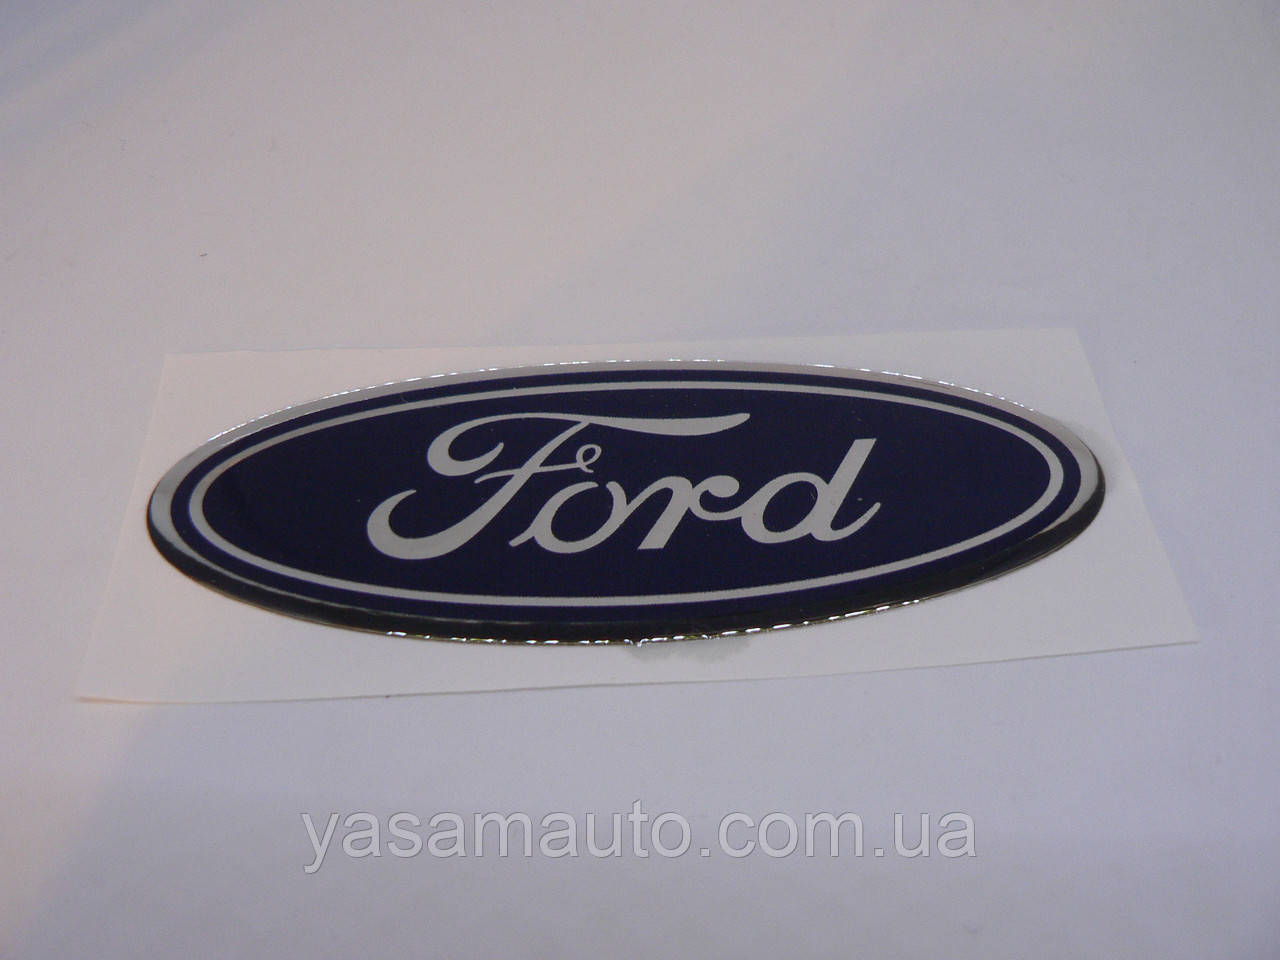 Наклейка s вставка в эмблему FORD овал 91.5х36.4х1.4мм силиконовая эмблема логотип марка бренд на авто Форд